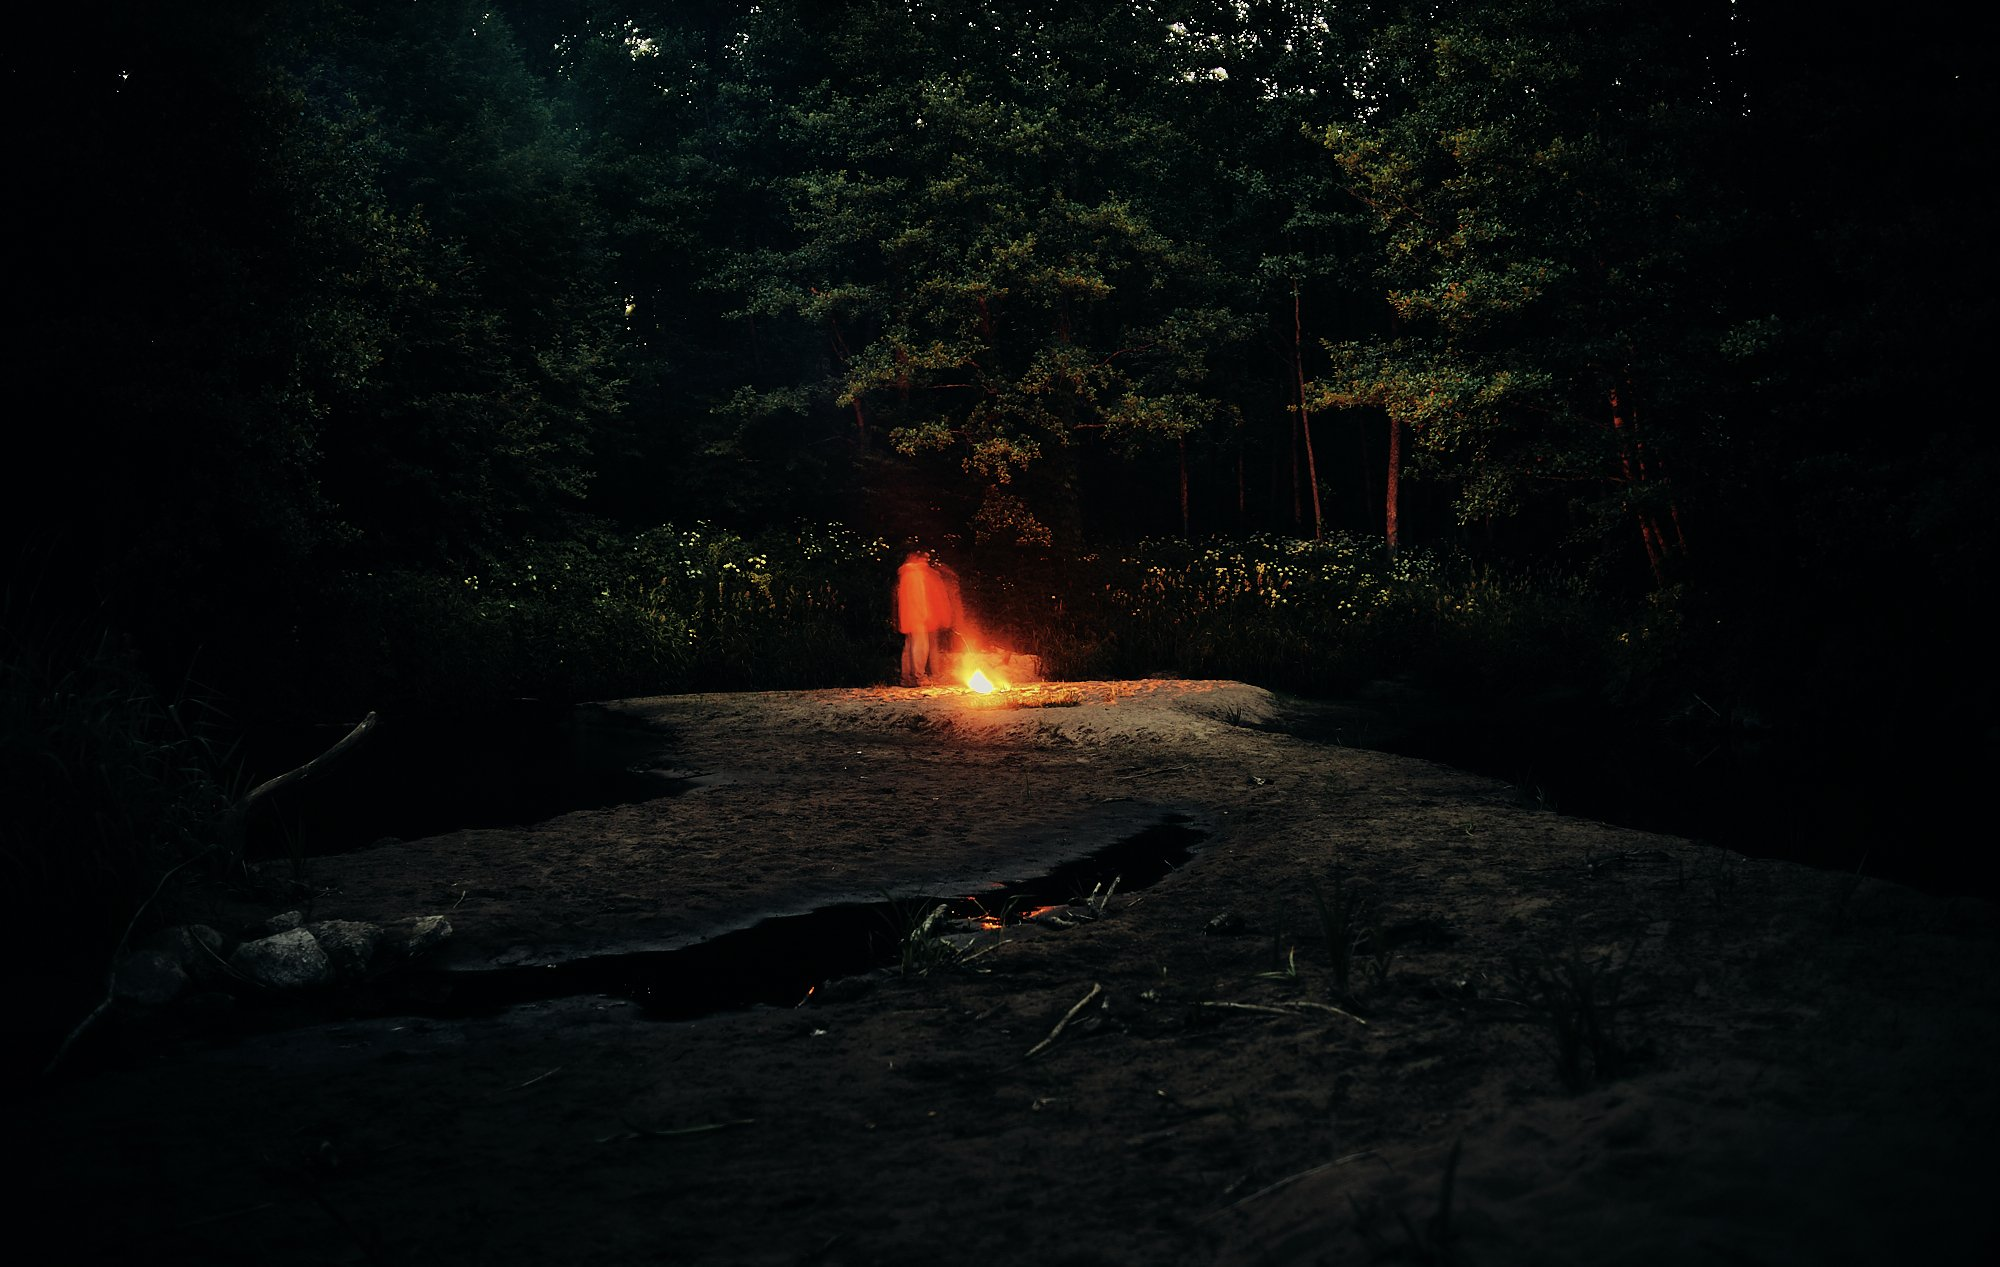 night mood atmosphere acid trip ночь костёр атмосфера, Александр Фанковин